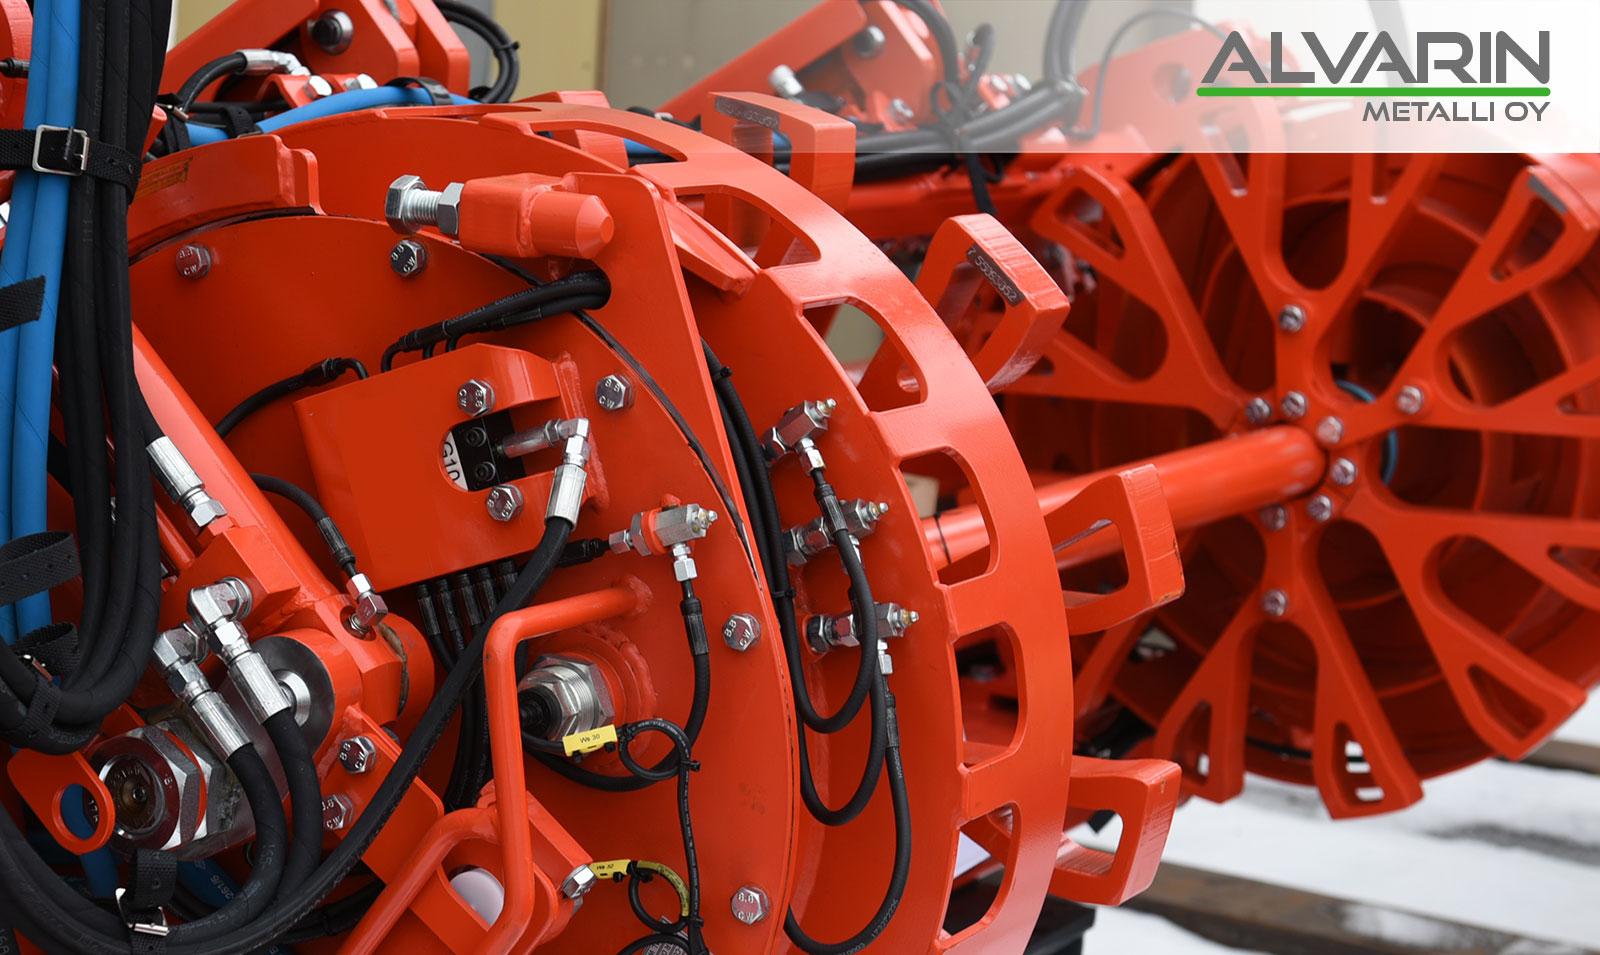 Alvarin_Metalli_alihankinta-konepaja-metalliteollisuus-referenssit_kappale_22